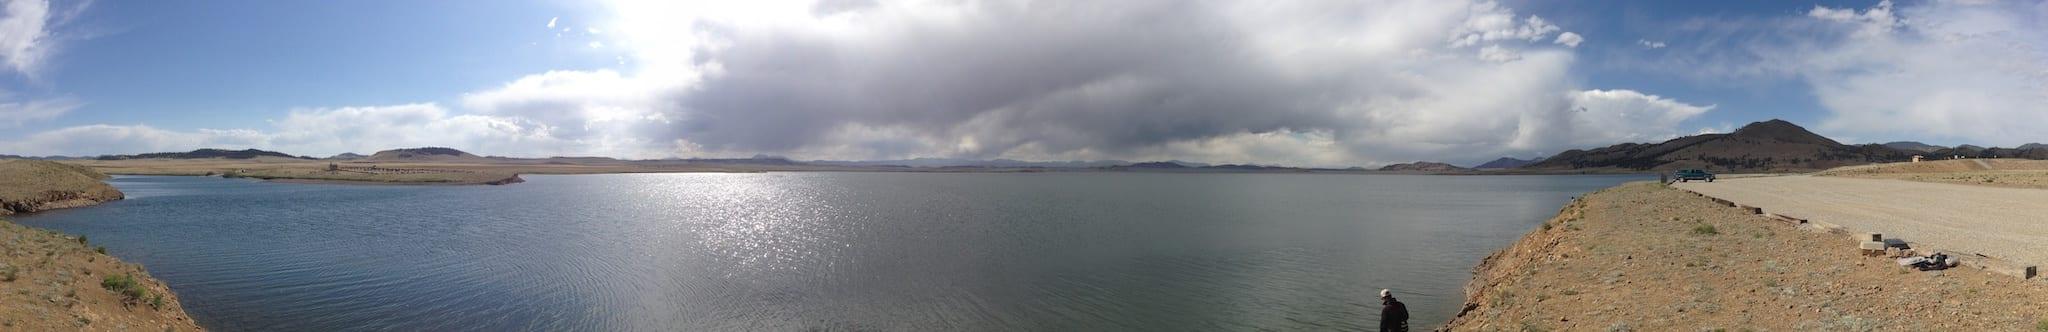 Spinney Mountain Reservoir Colorado Panorama